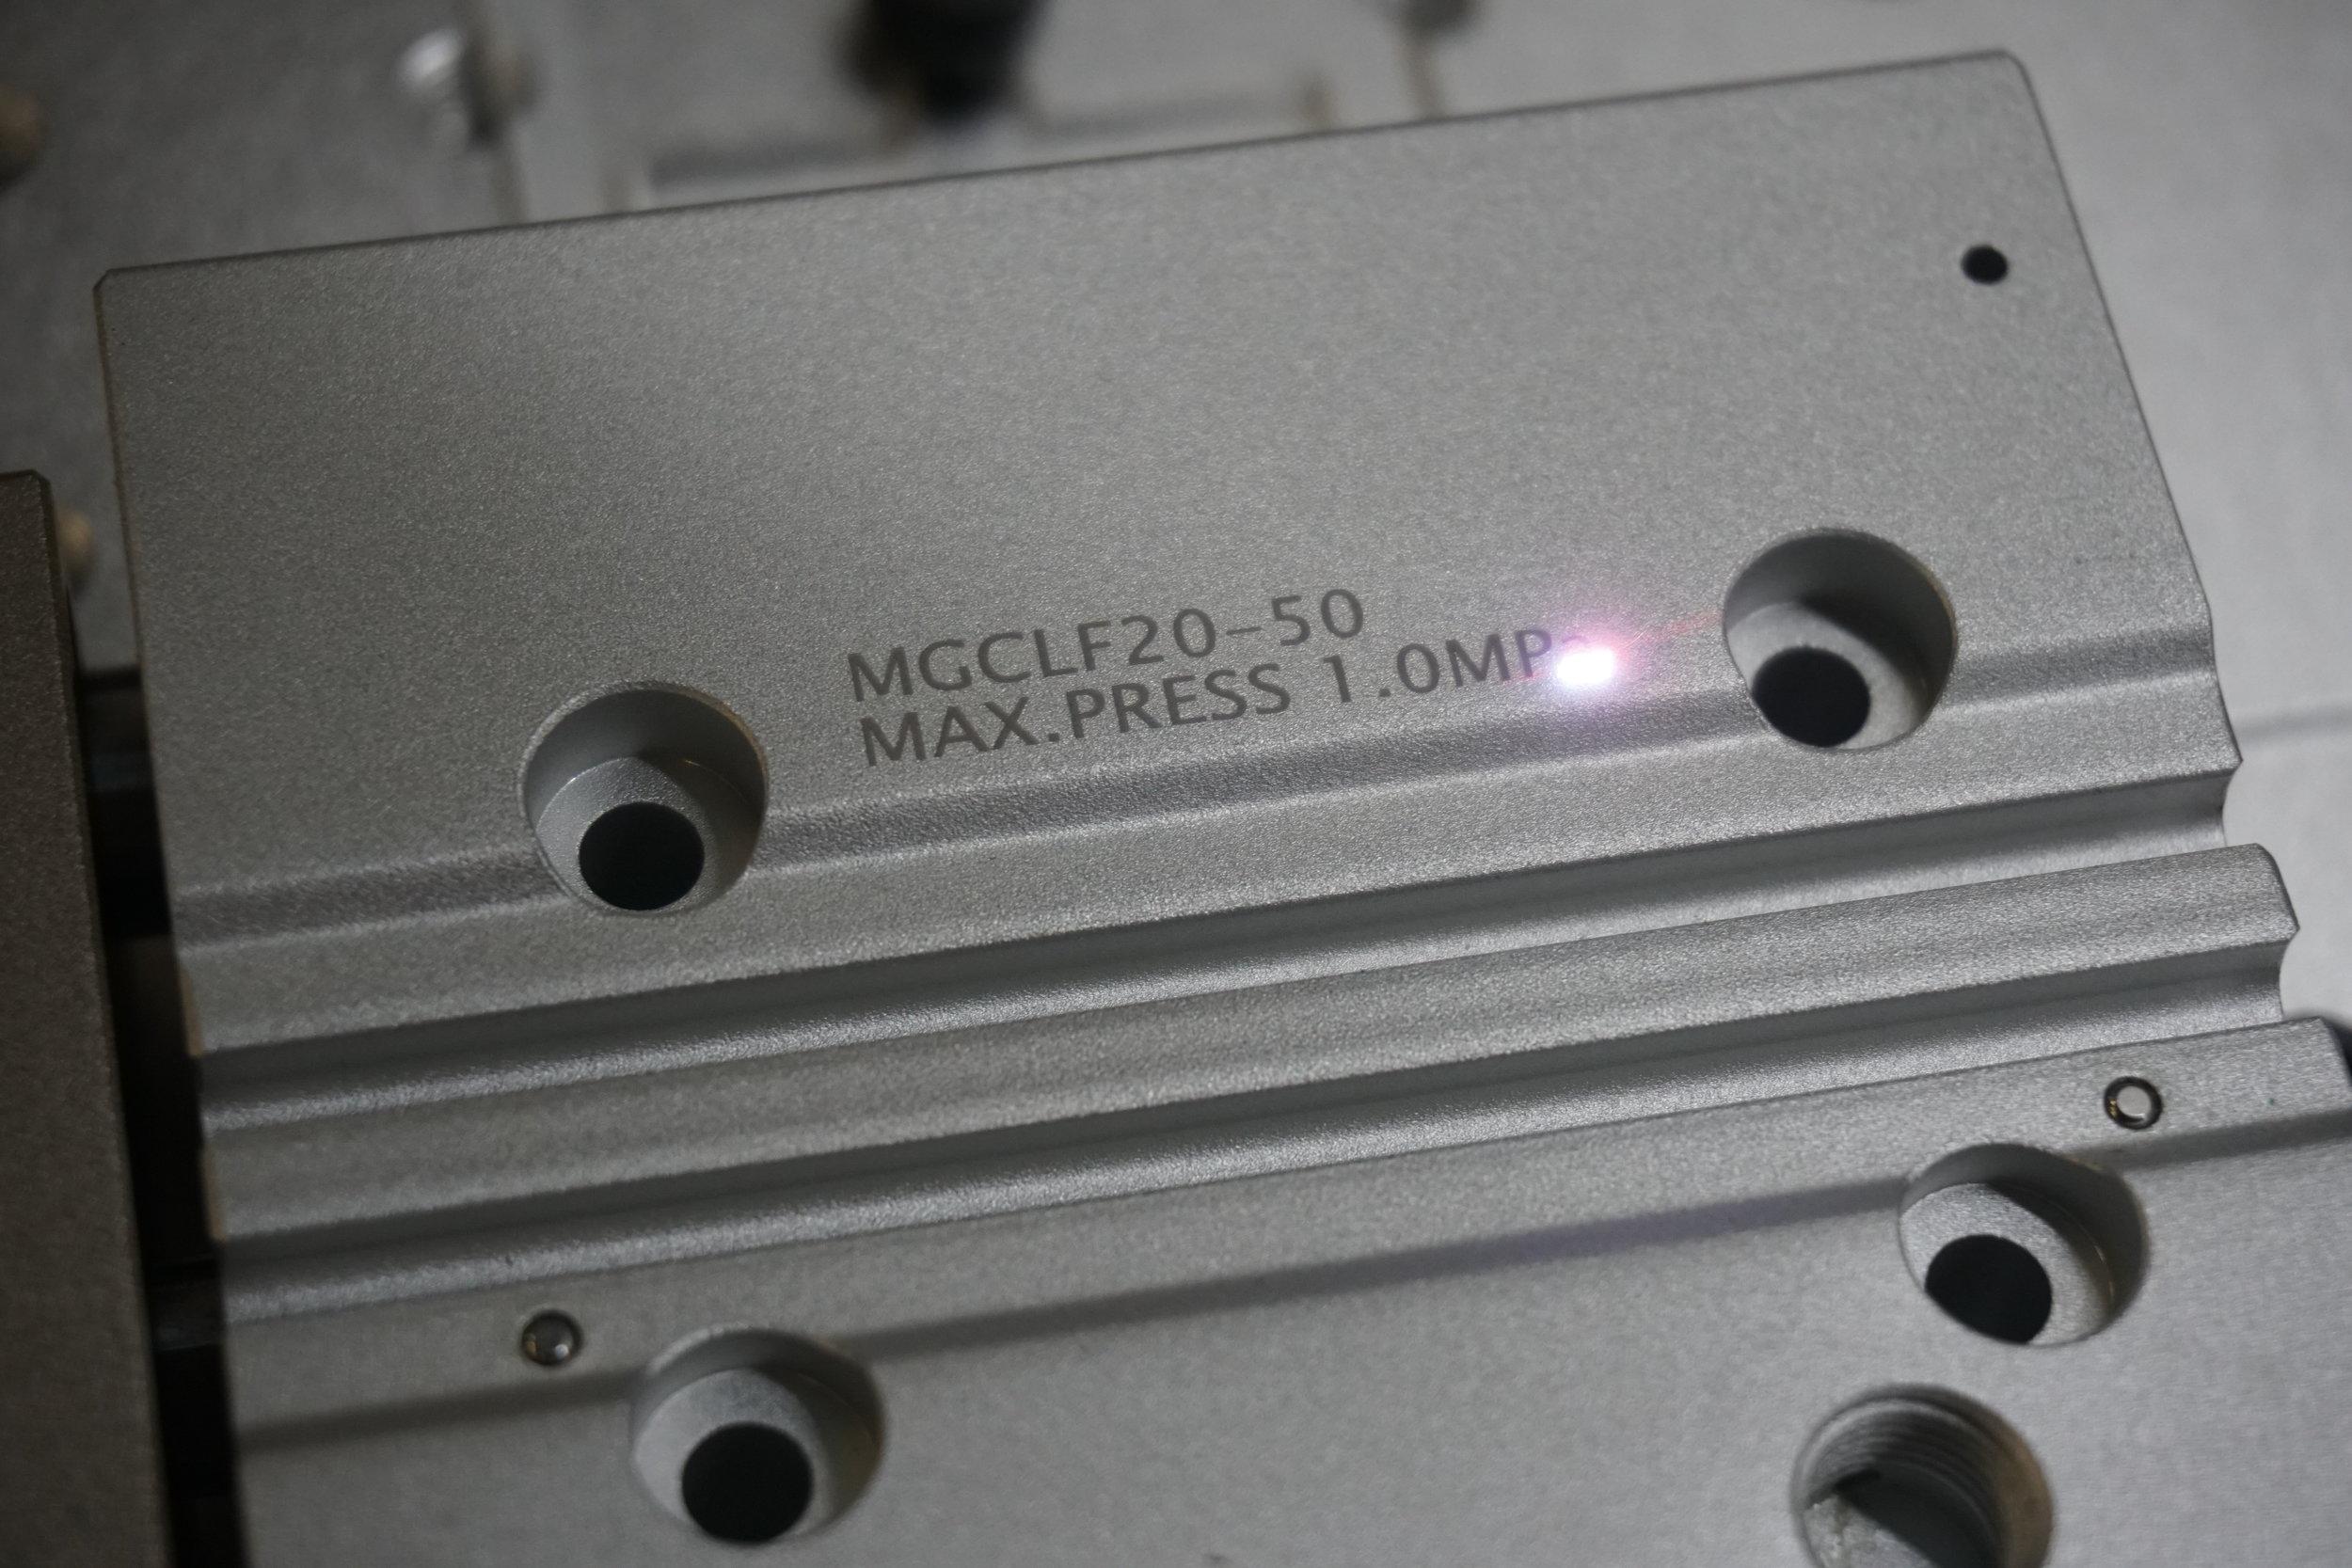 Aluminum dark marking